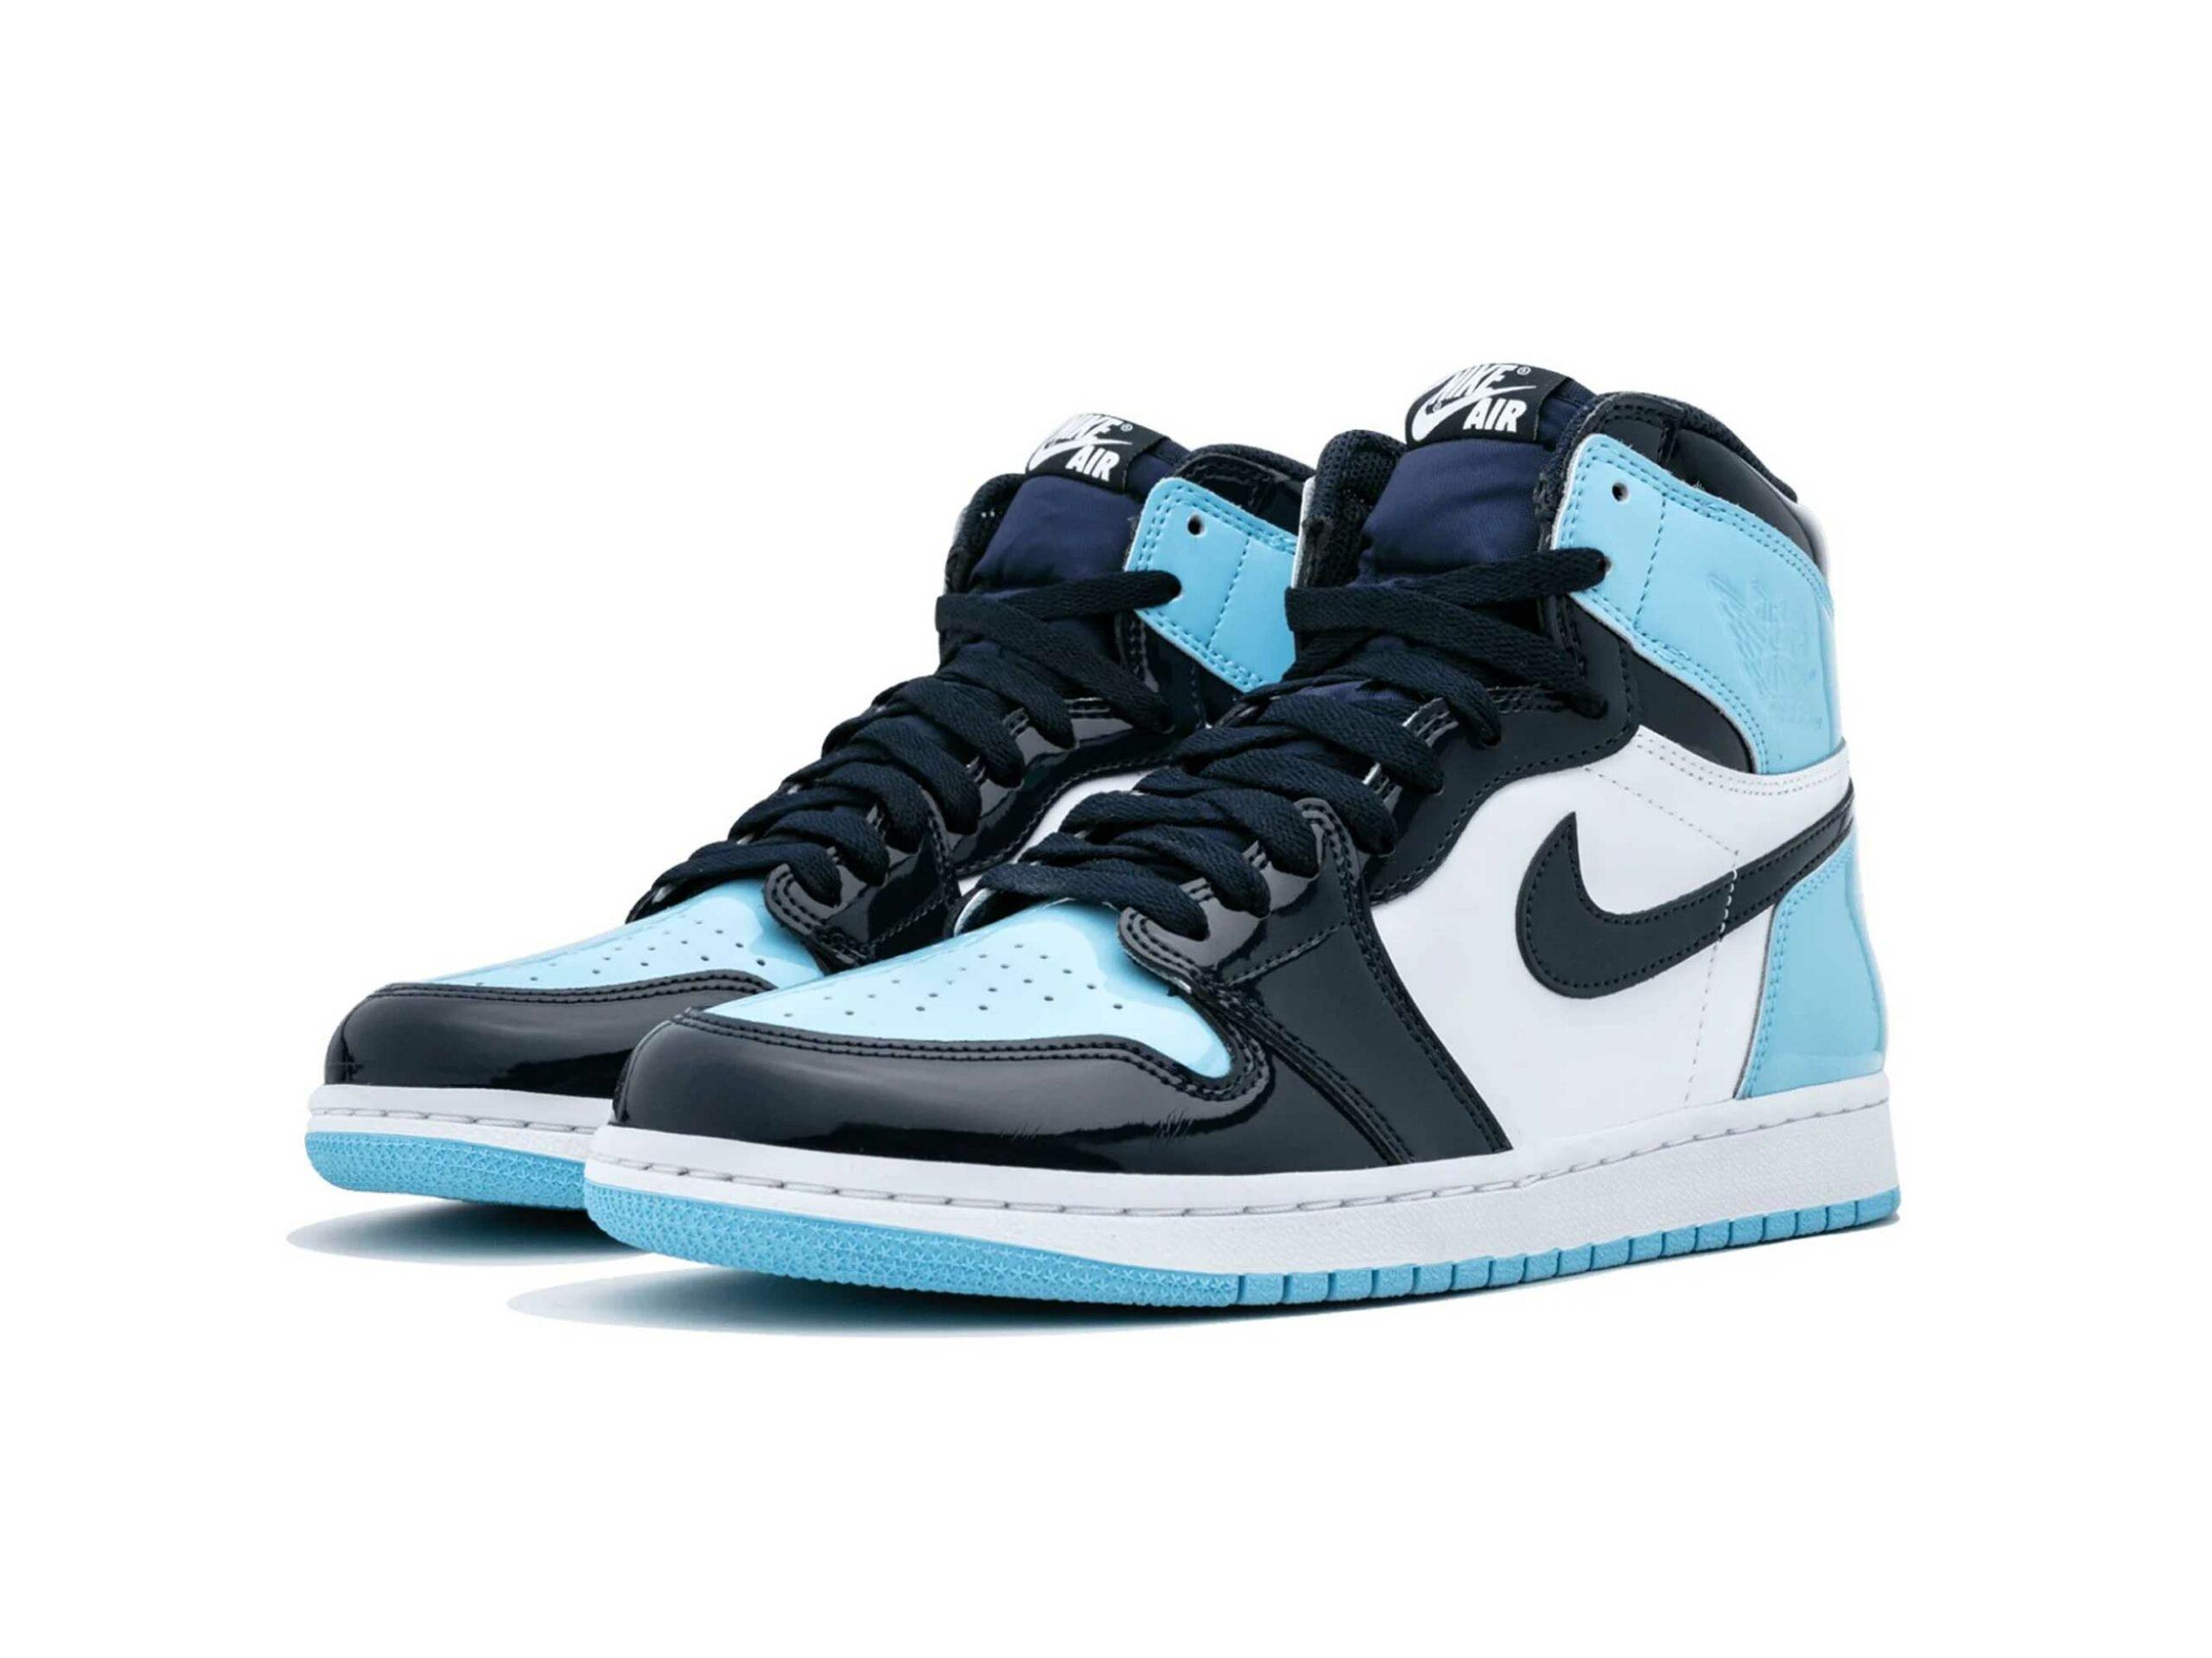 nike air Jordan 1 high UNC patent leather CD0461_401 купить